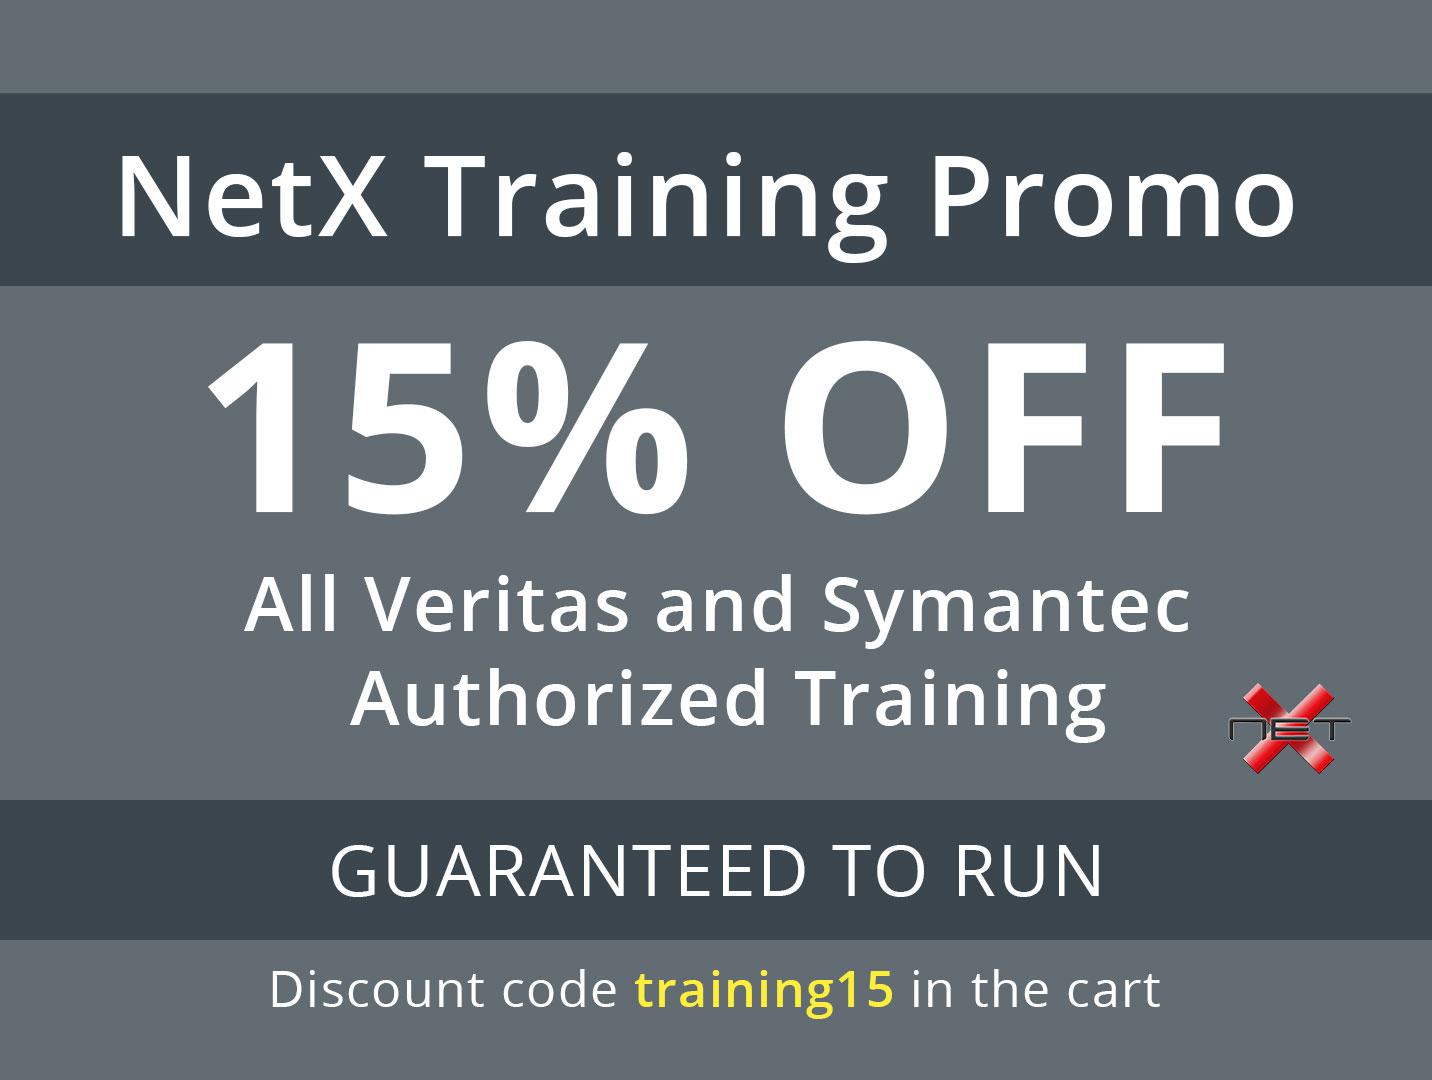 NetX 15% Discount Veritas and Symantec Authorized Training Promotion